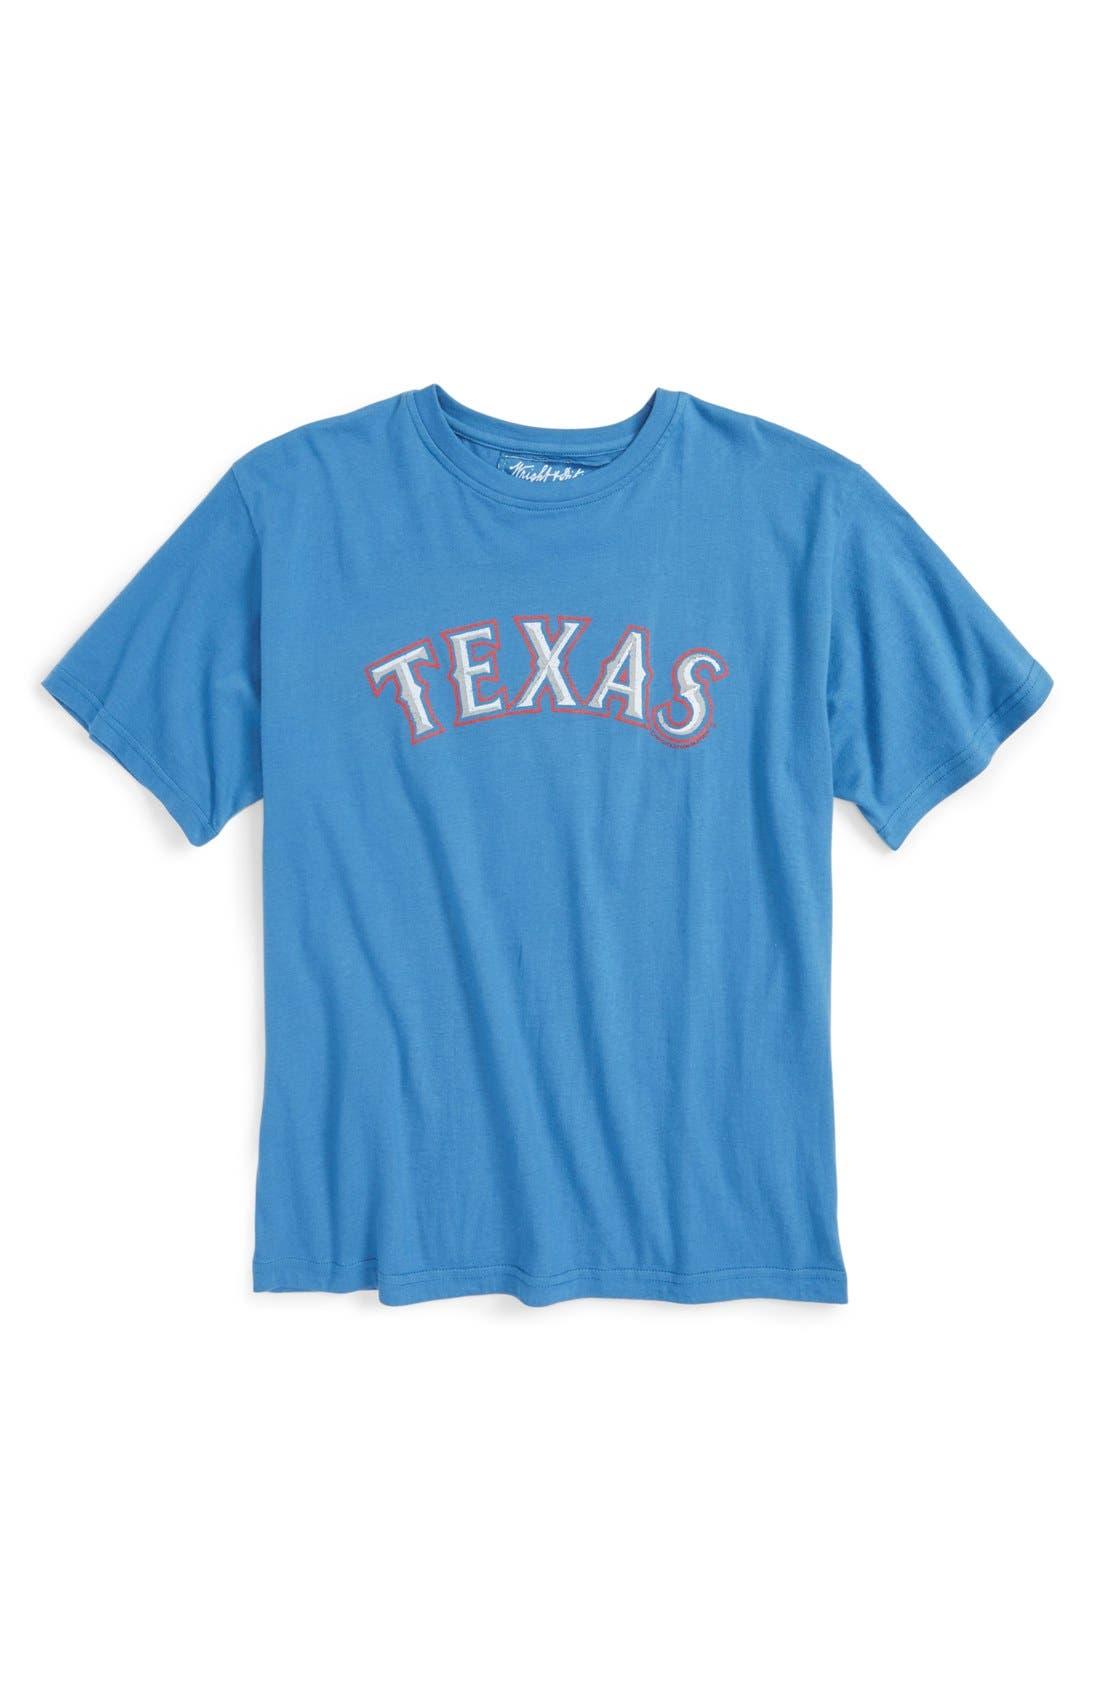 Main Image - Wright & Ditson 'Texas Rangers' T-Shirt (Little Boys & Big Boys)